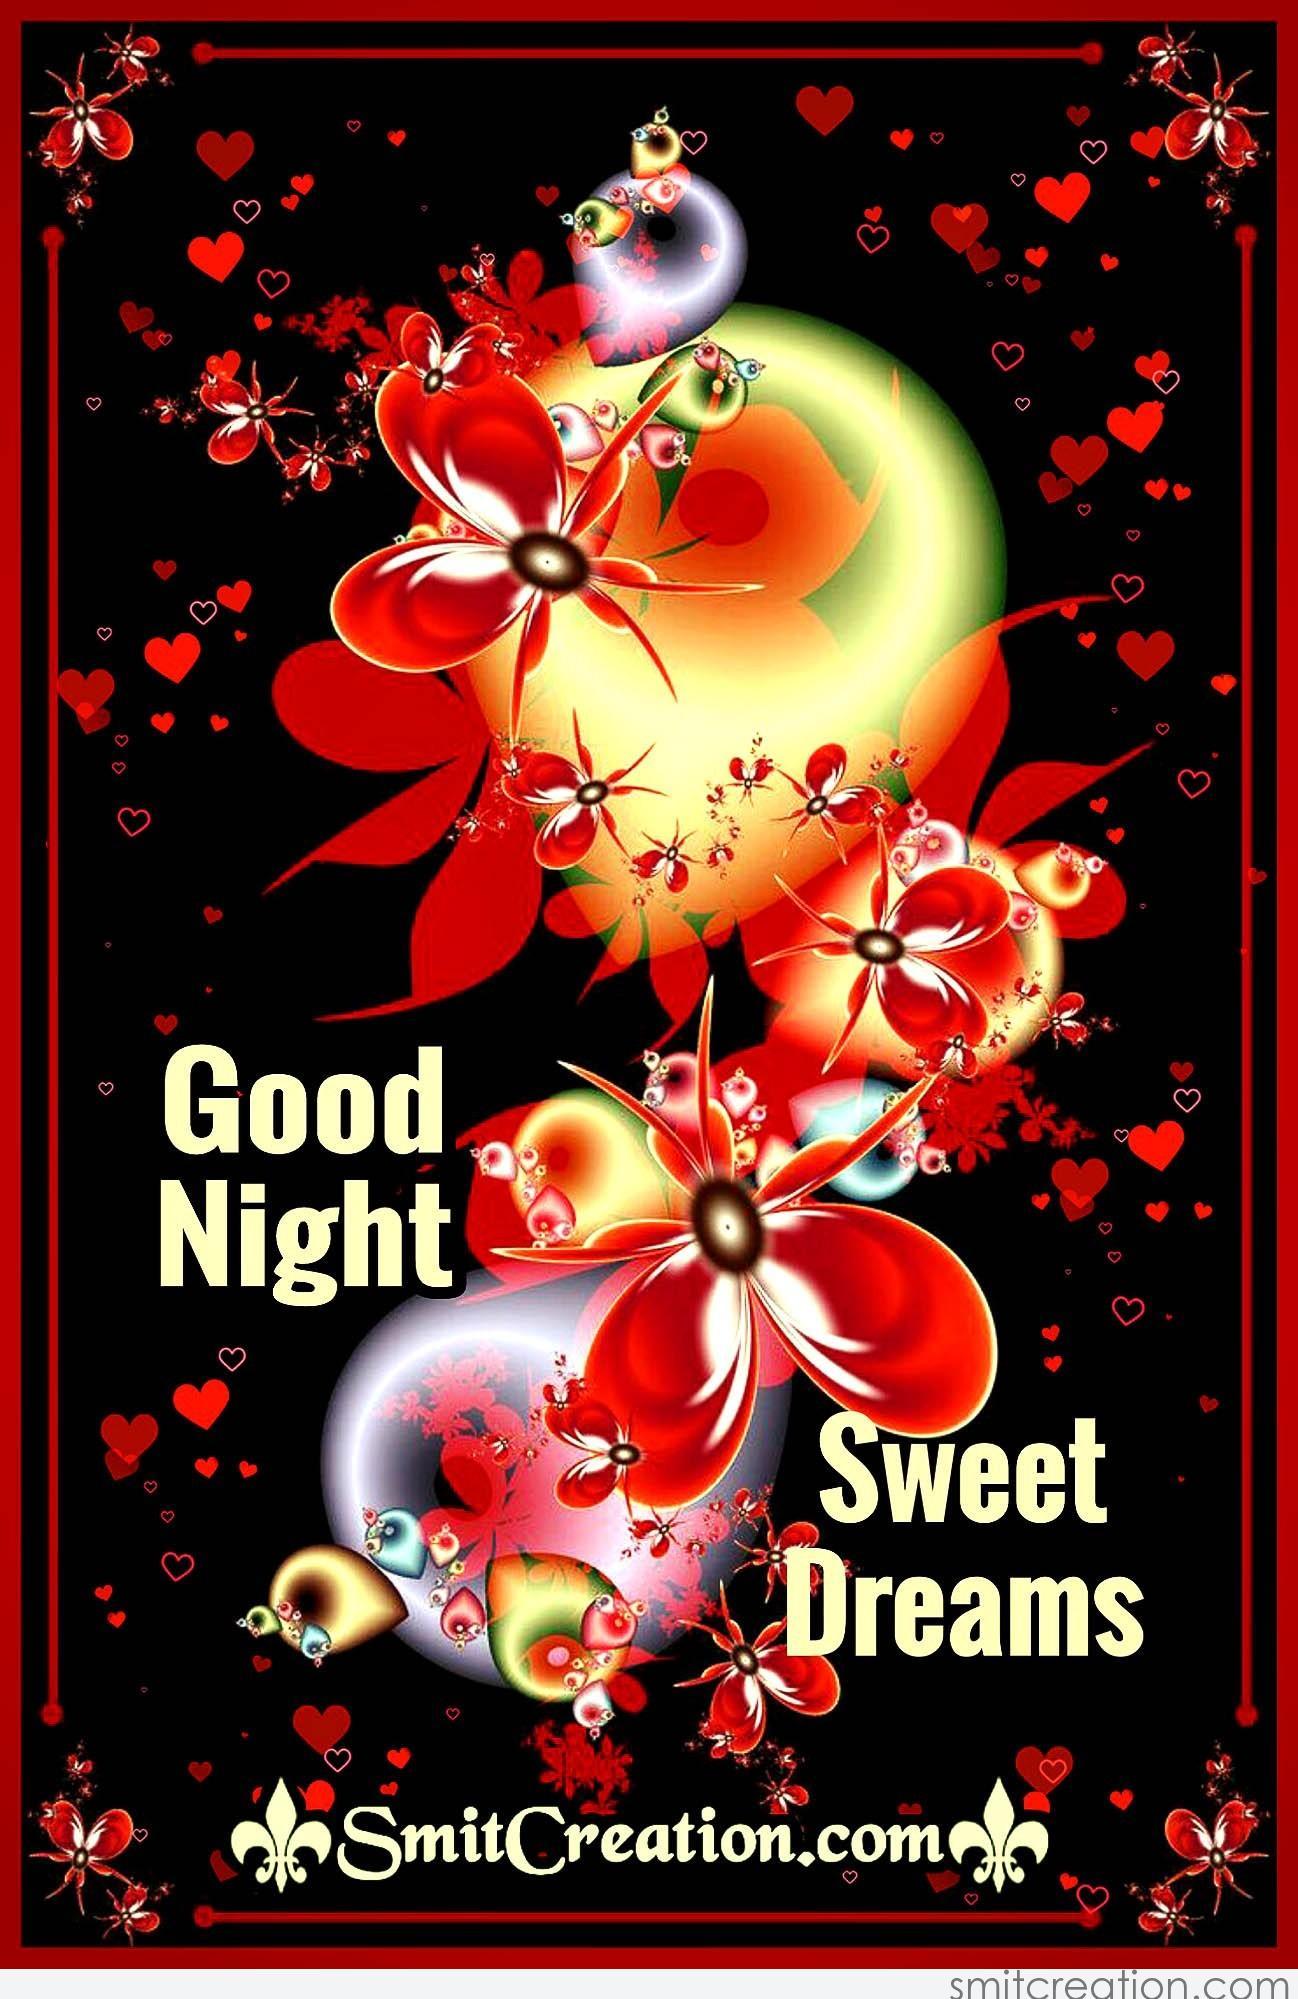 Good Night Pictures And Graphics Smitcreationcom